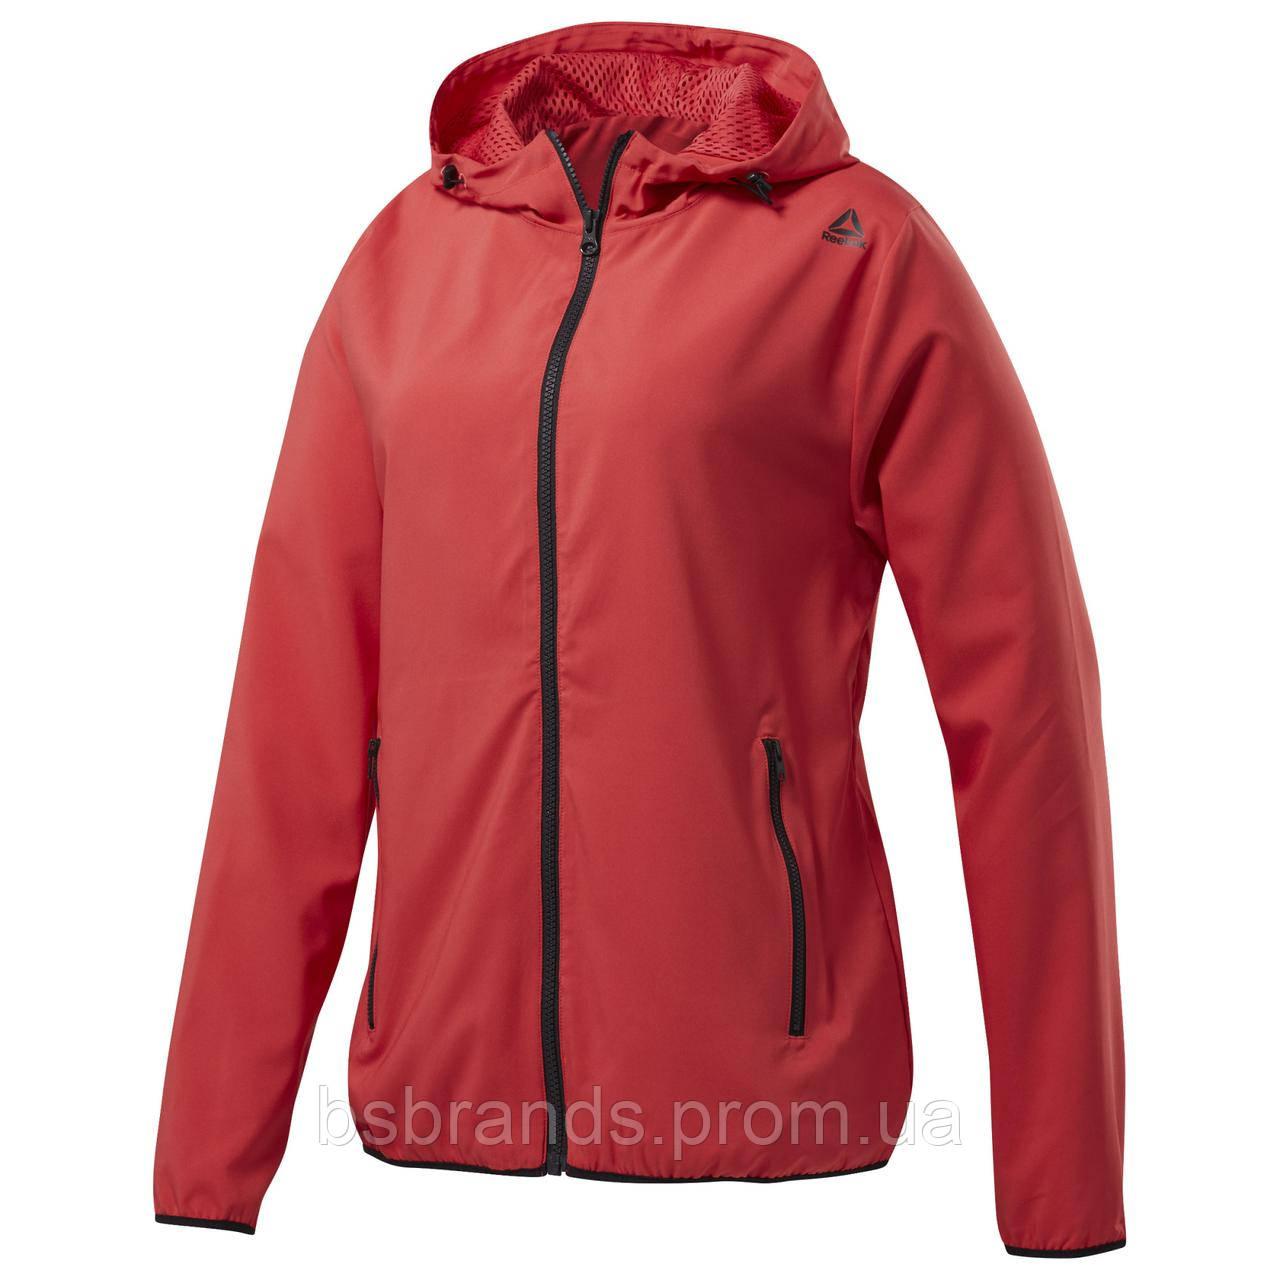 Женская спортивная куртка Reebok WOVEN JACKET EJ9427